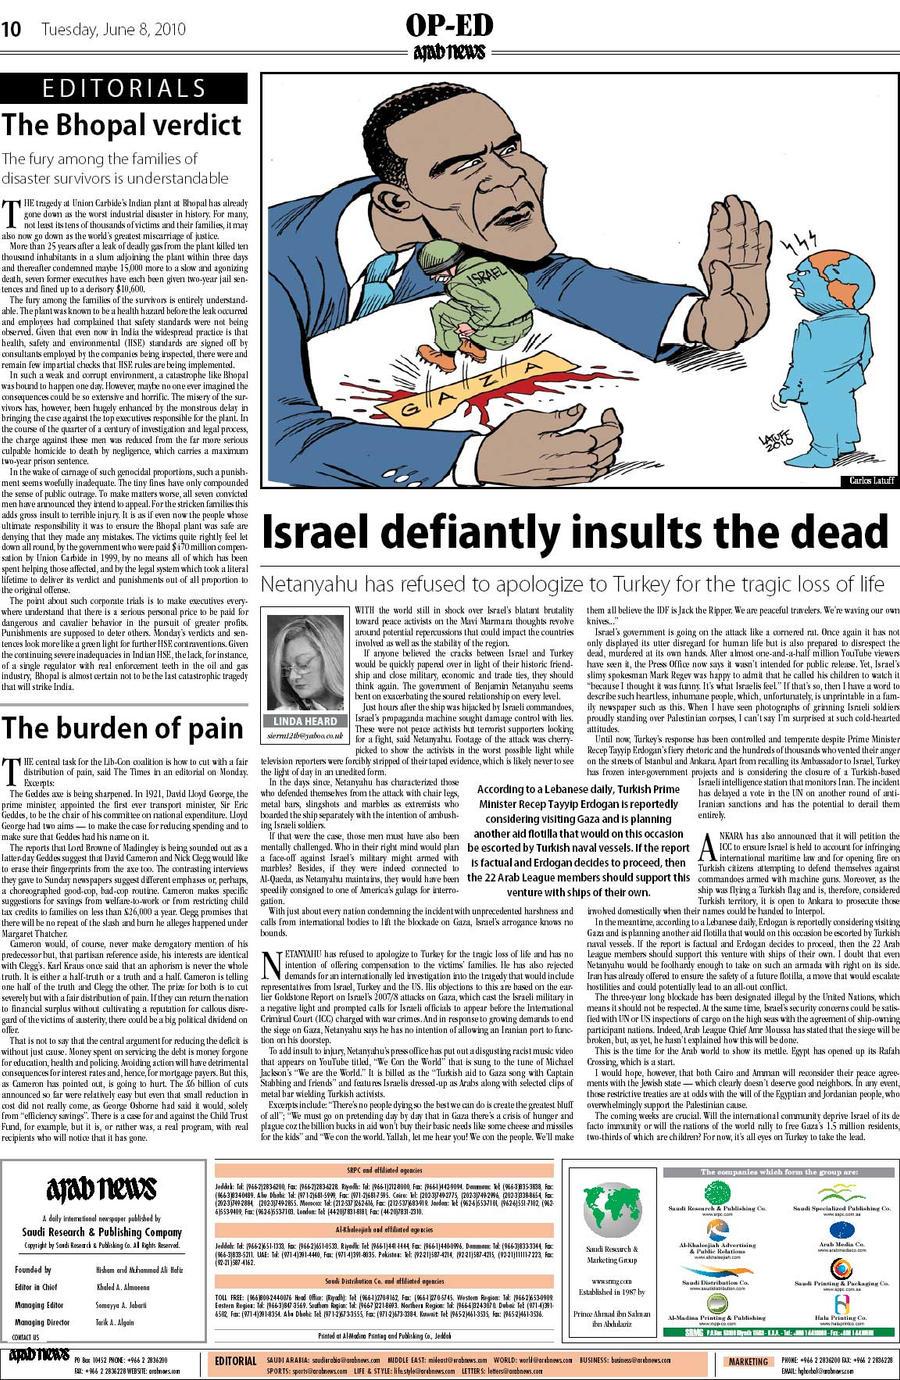 Blockade cartoon in Arabnews